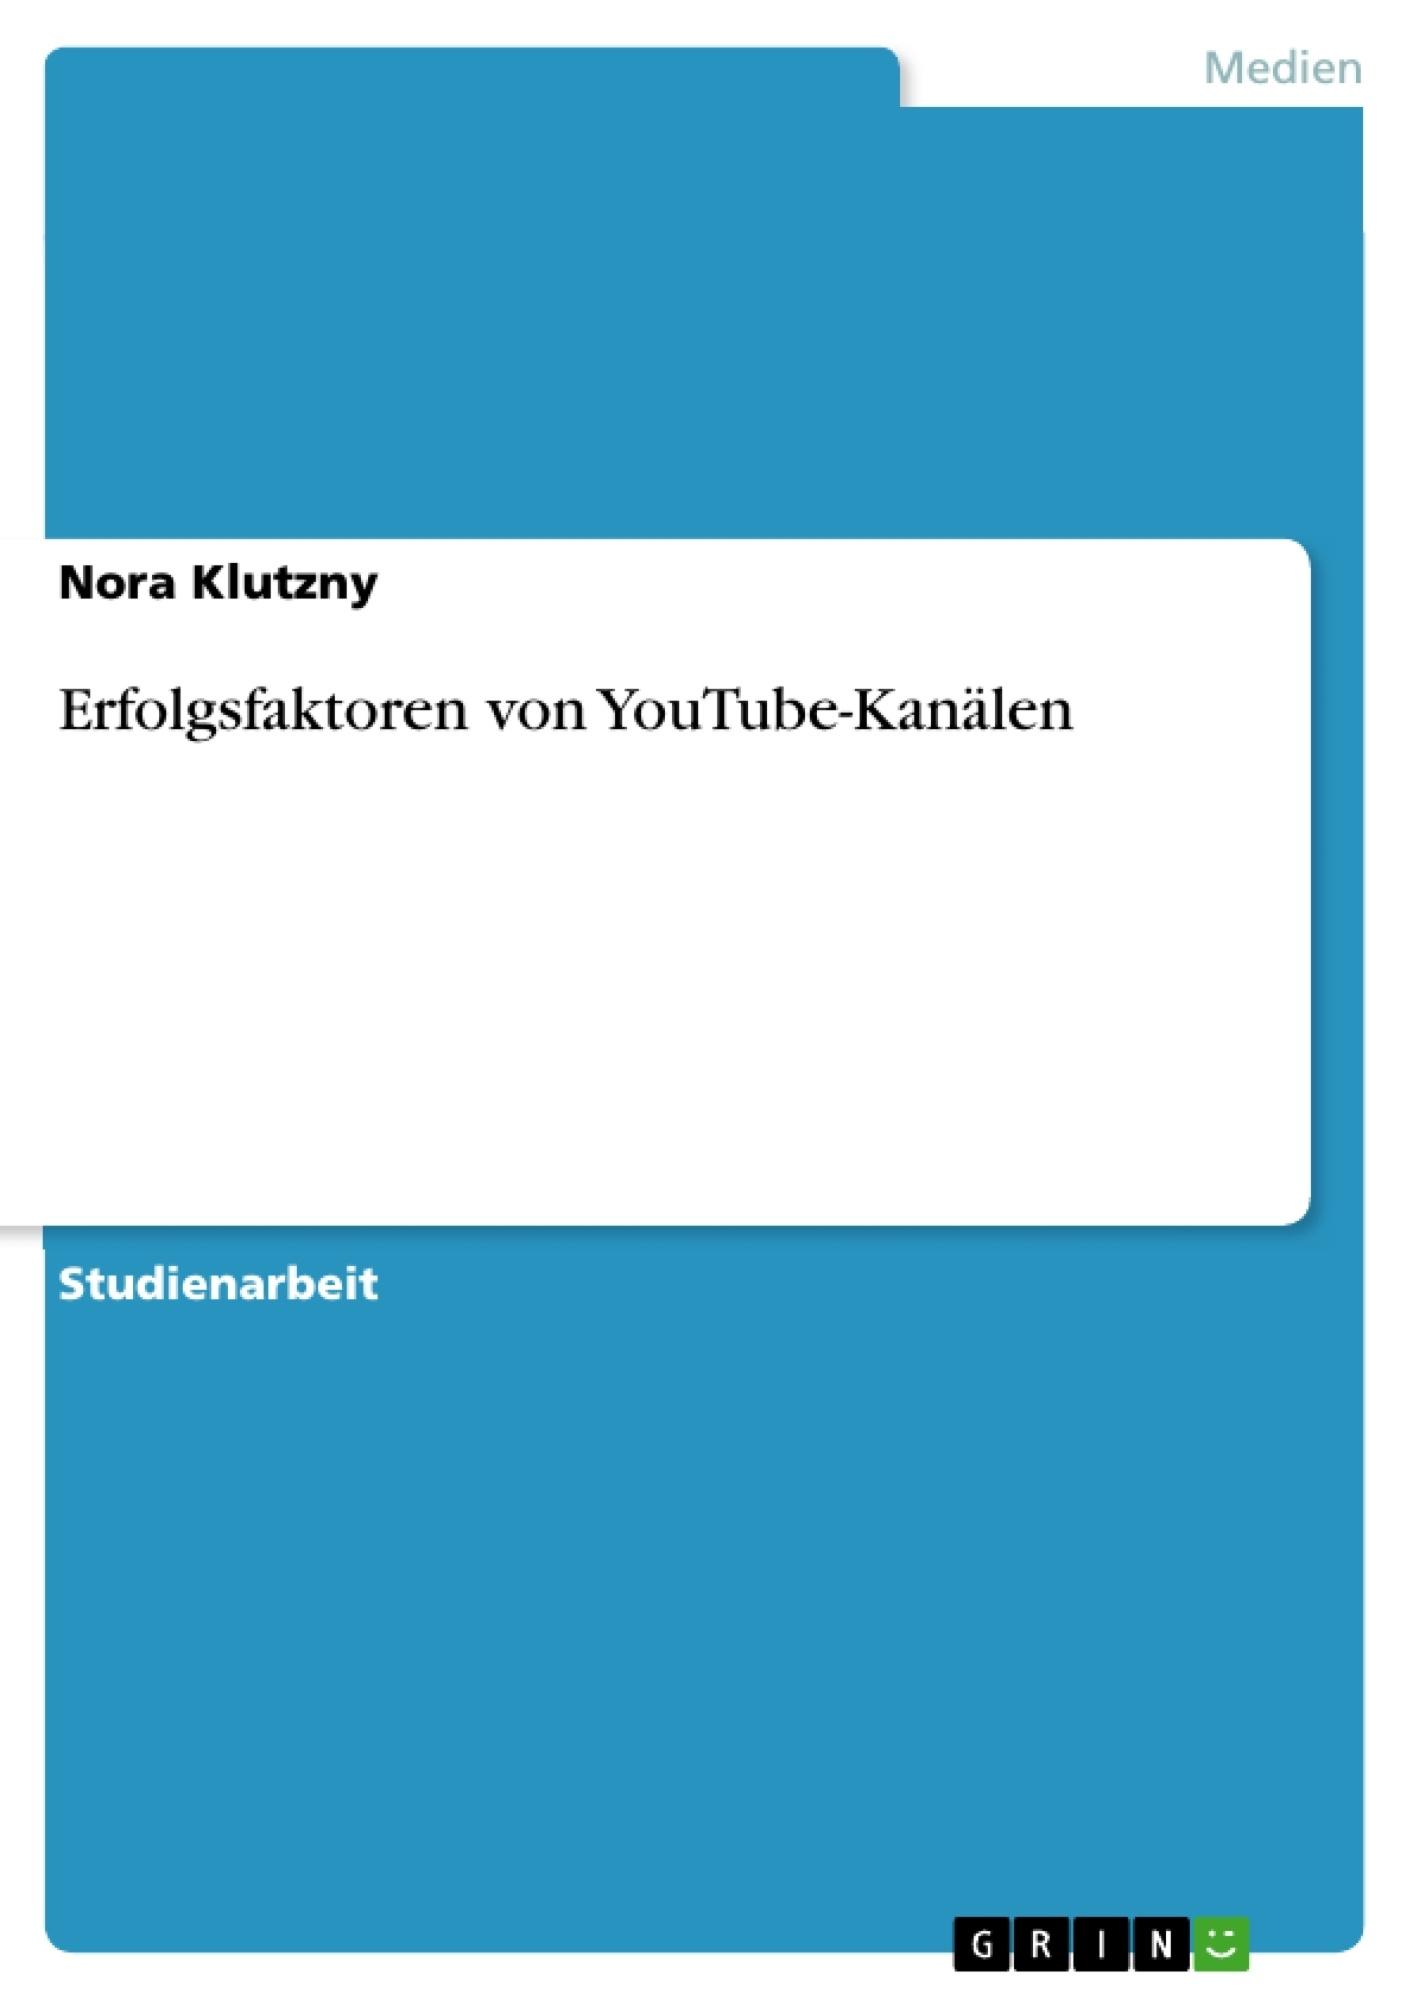 Titel: Erfolgsfaktoren von YouTube-Kanälen